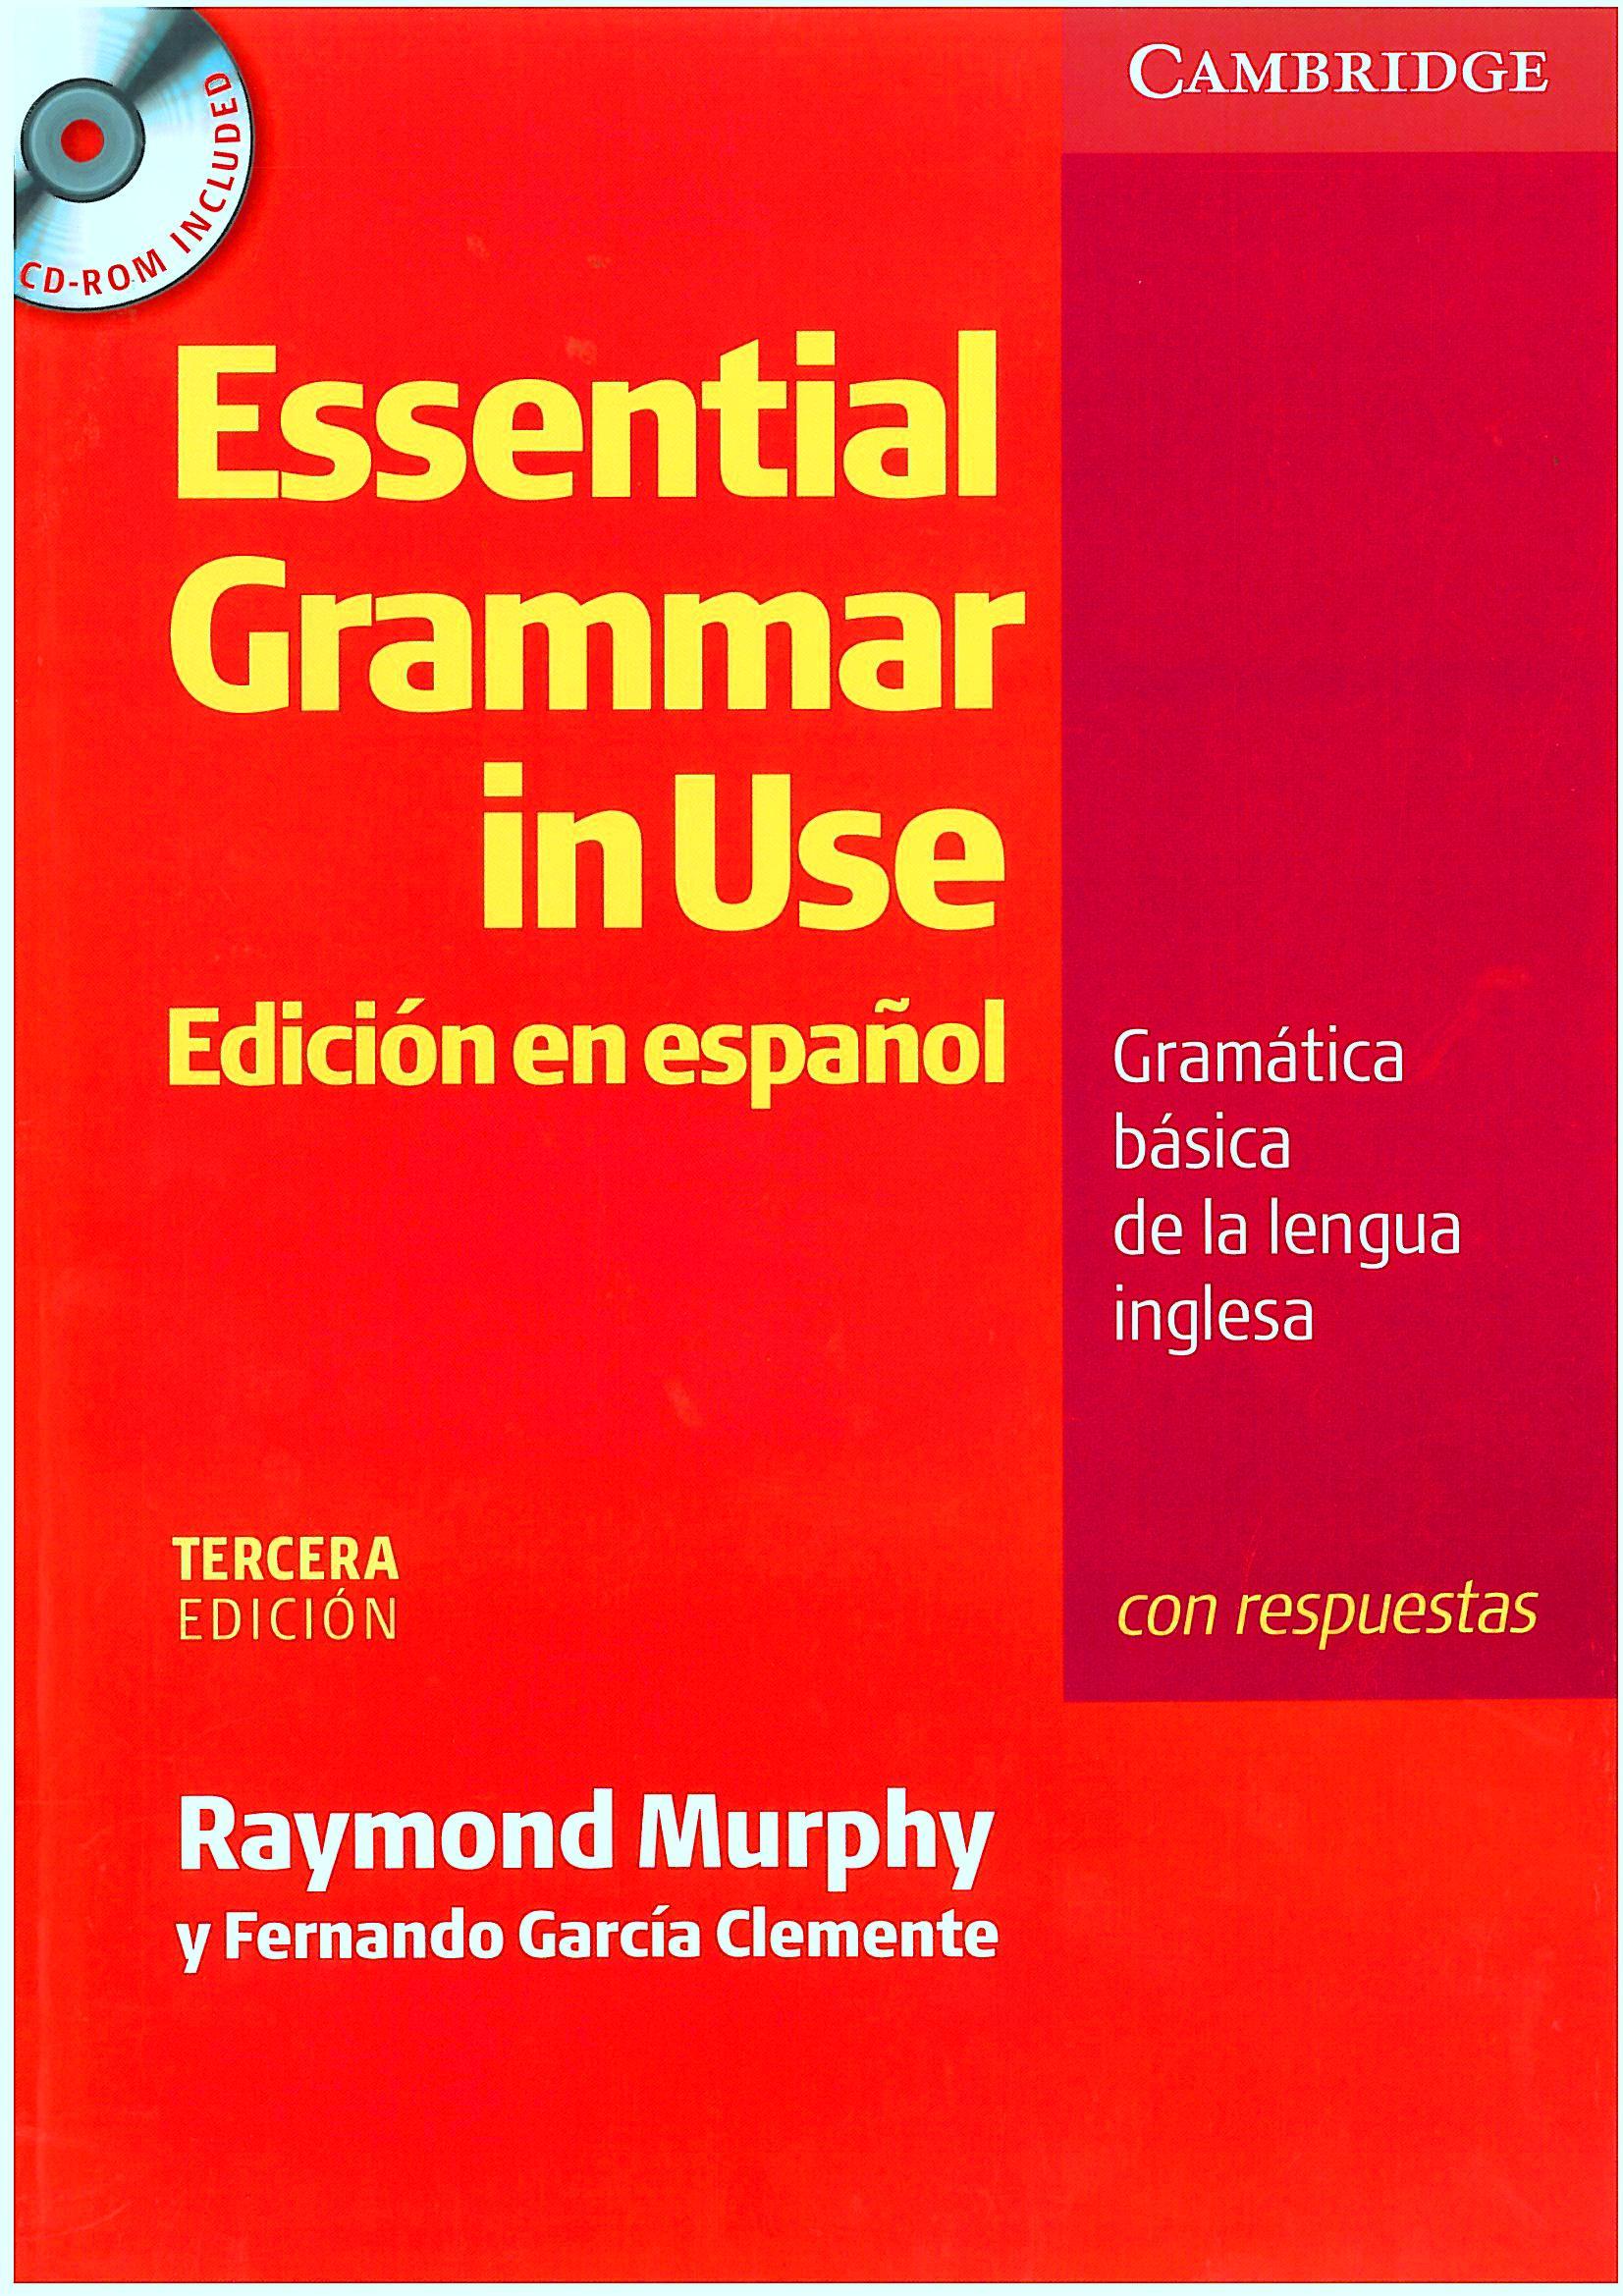 Blog De Ingles Portobello Road W Essential Grammar In